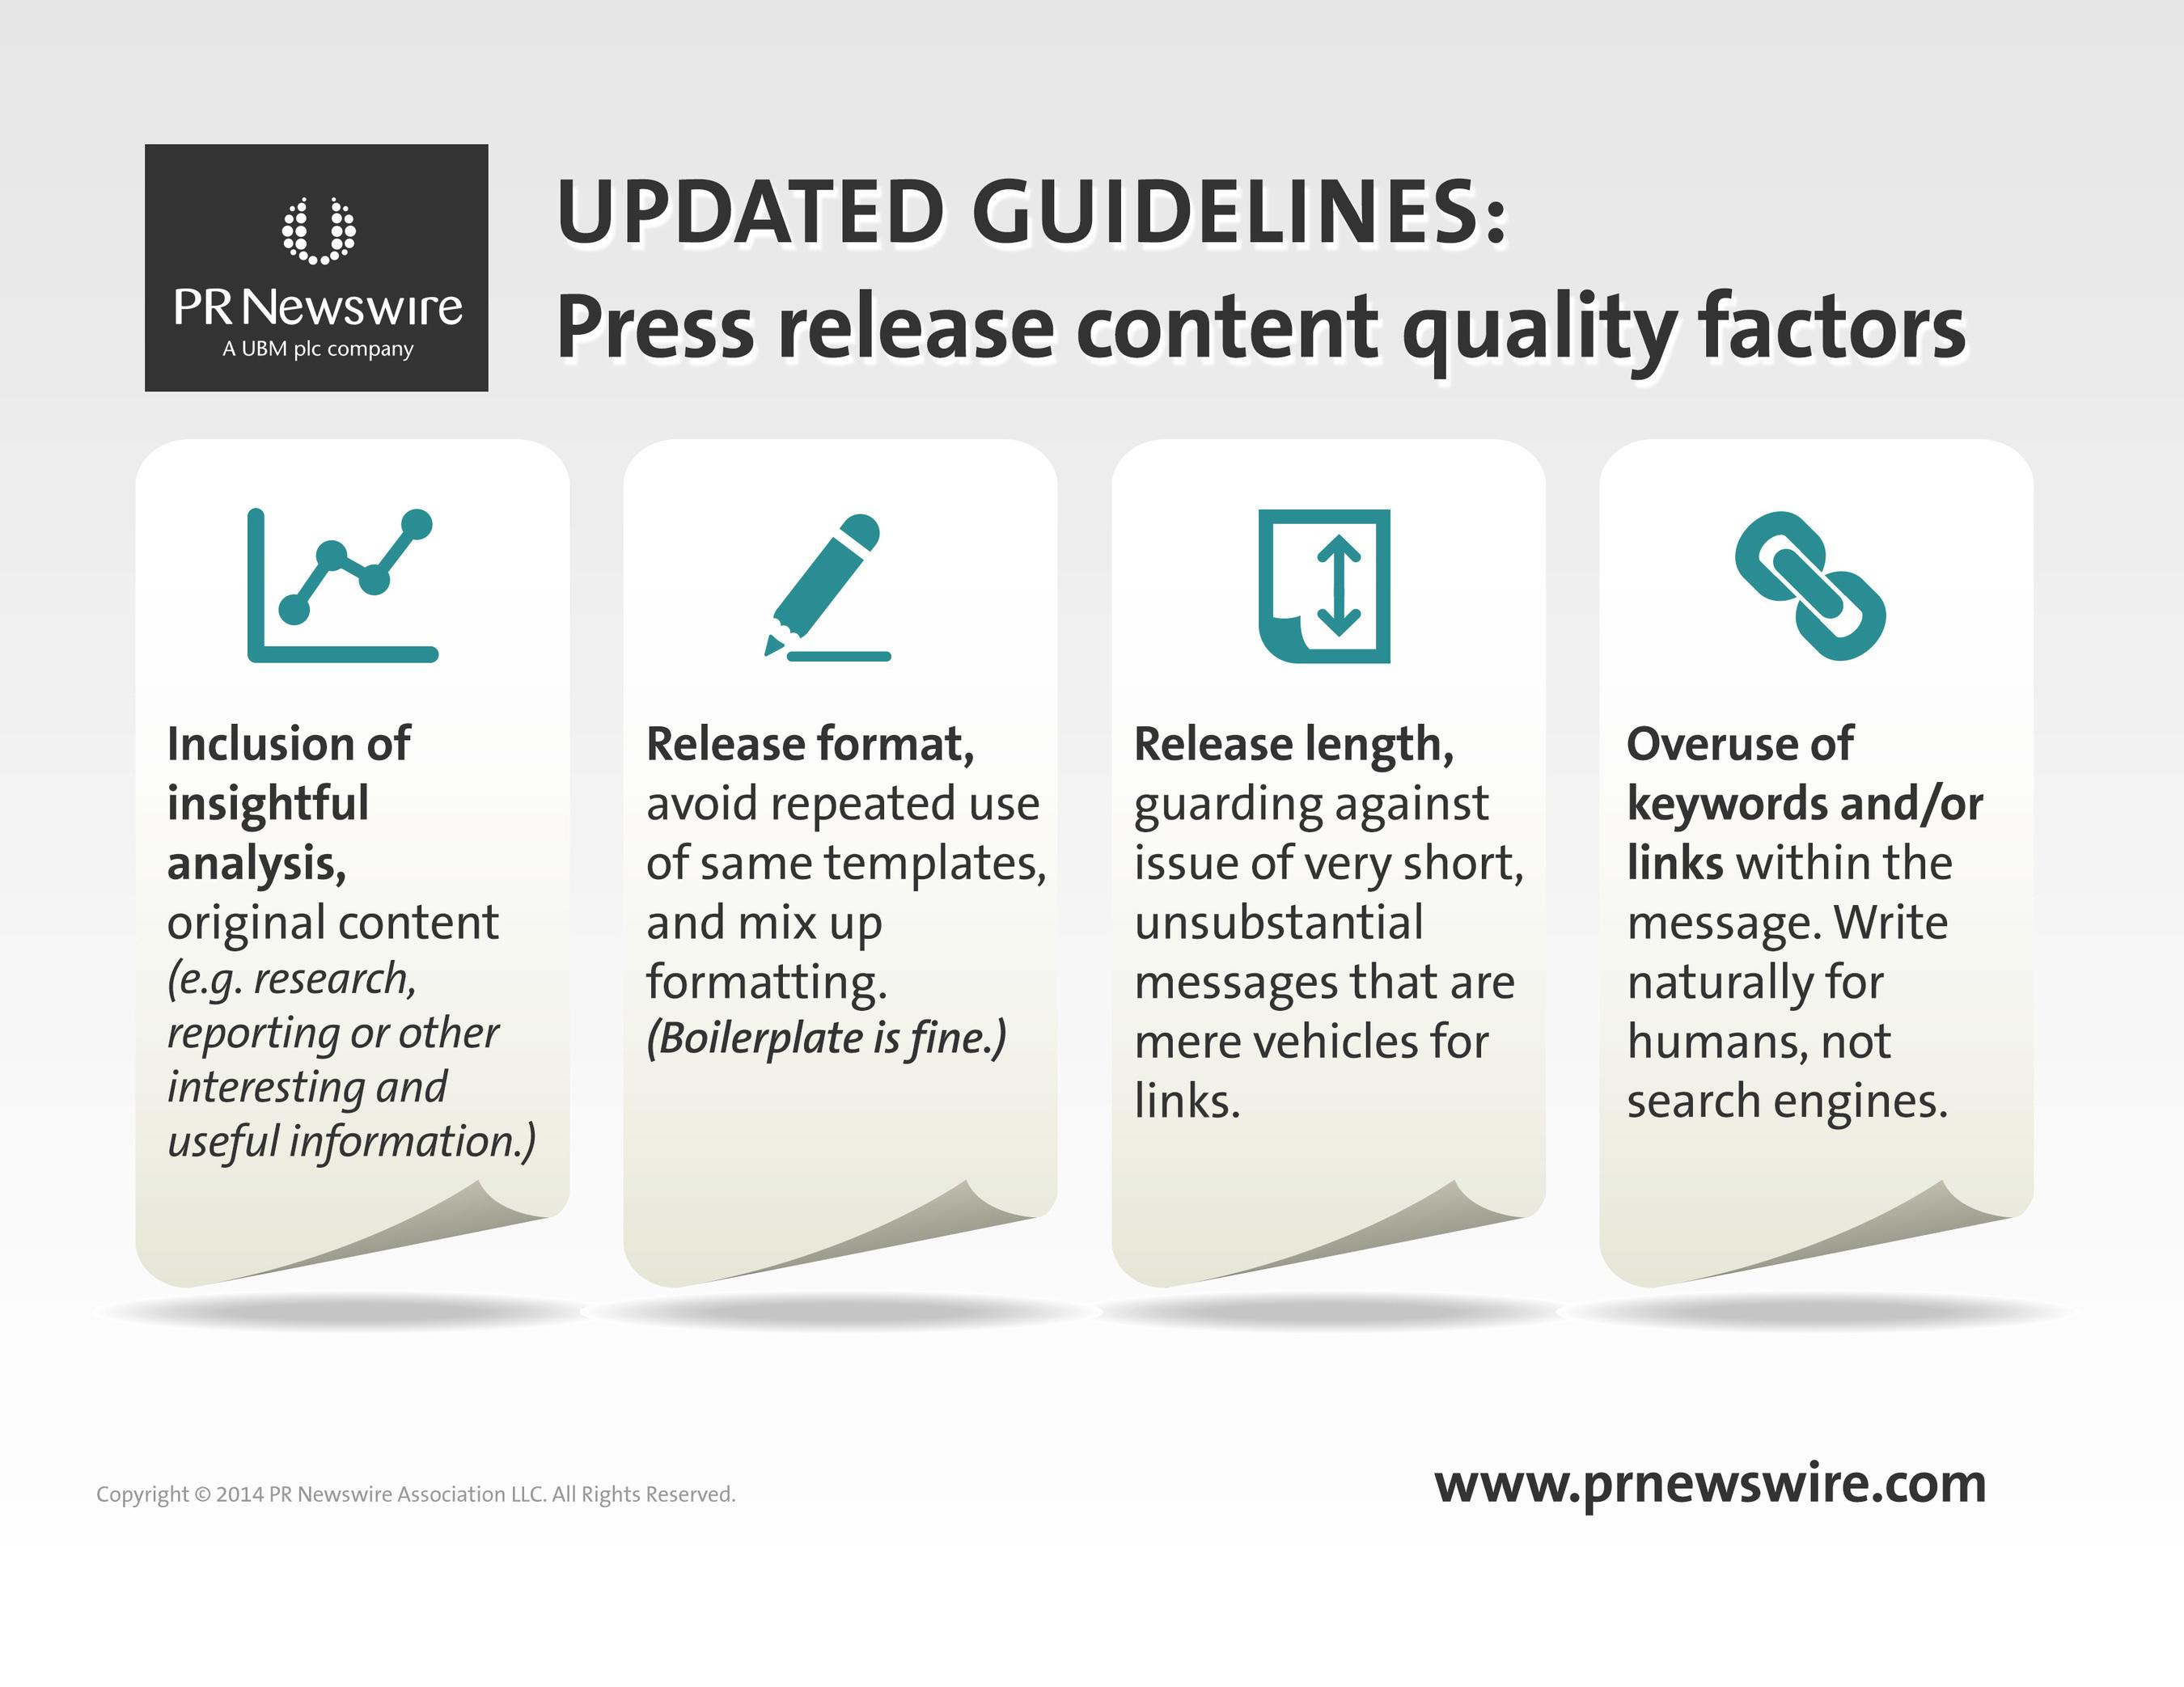 PR Newswire's new guidelines to improve press release content quality. (PRNewsFoto/PR Newswire Association LLC)